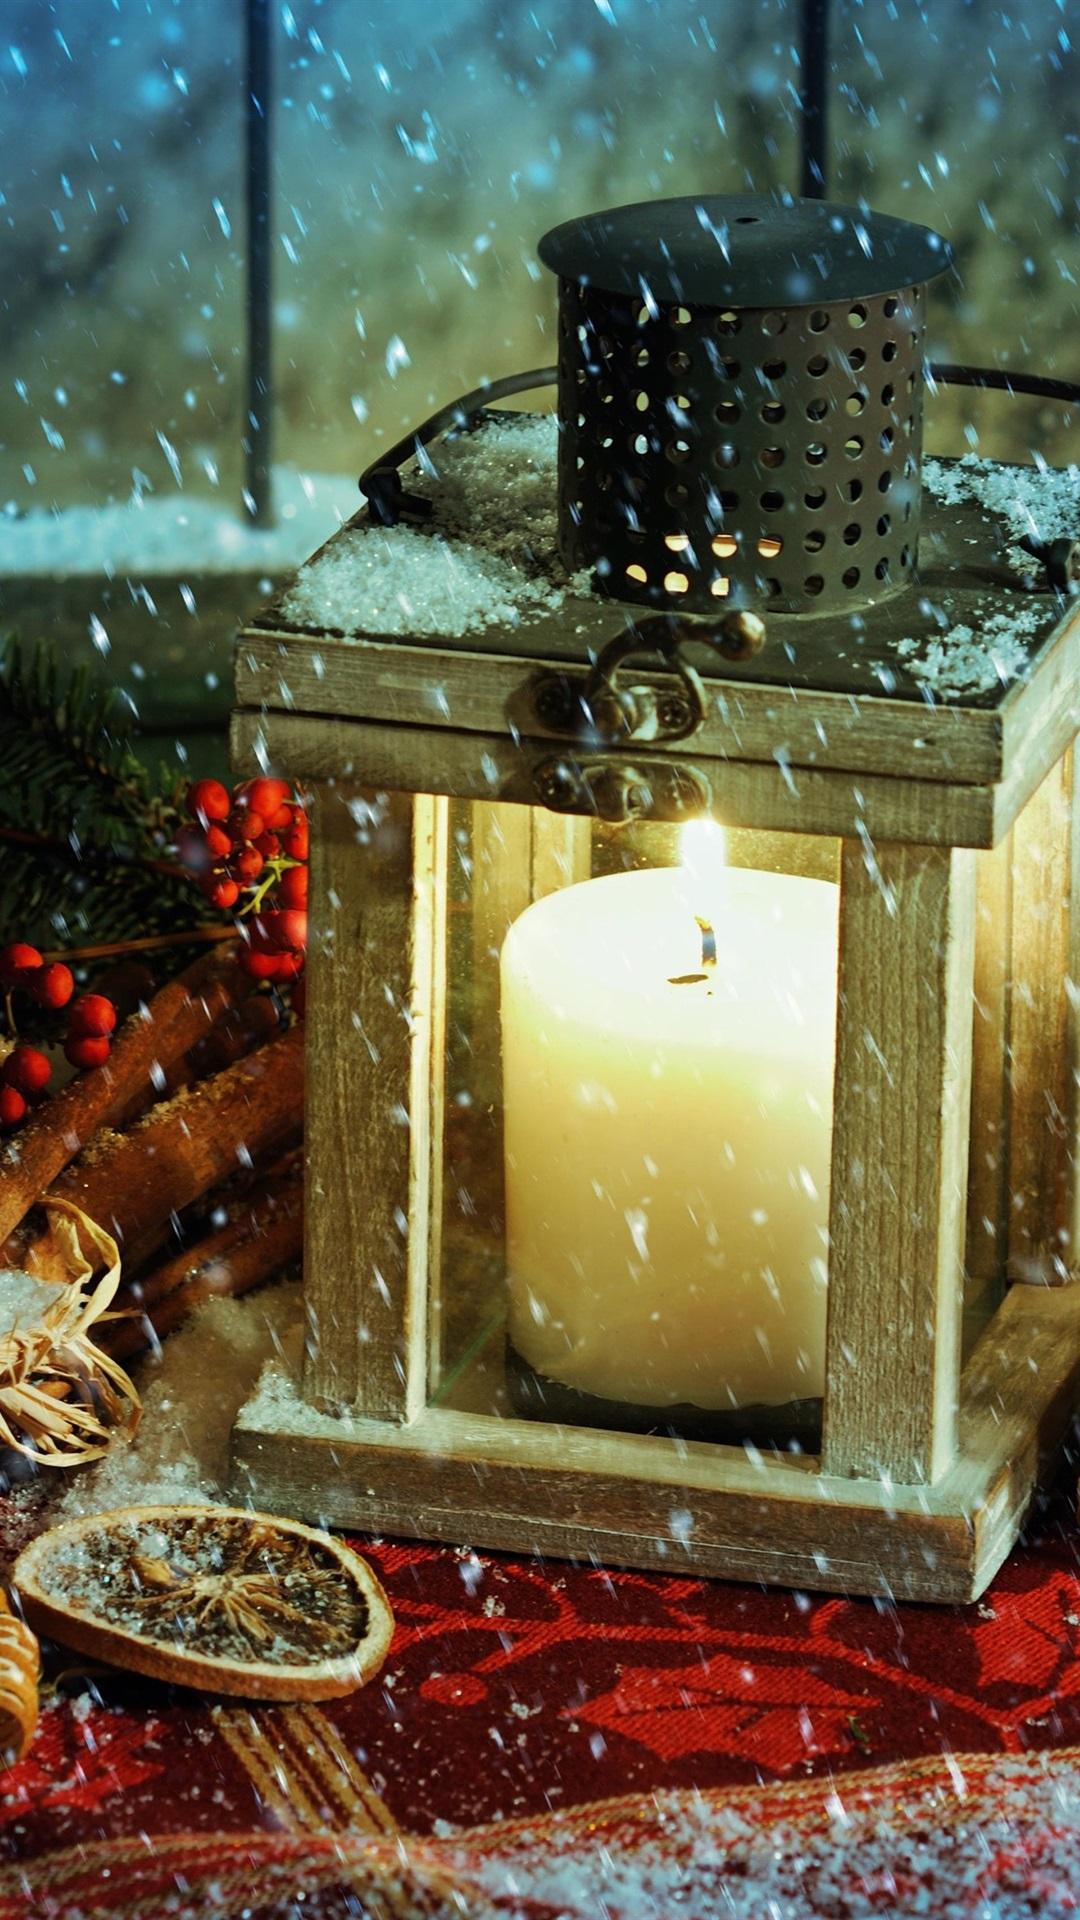 Christmas Themed Lantern Candles Fire Snow 1080x1920